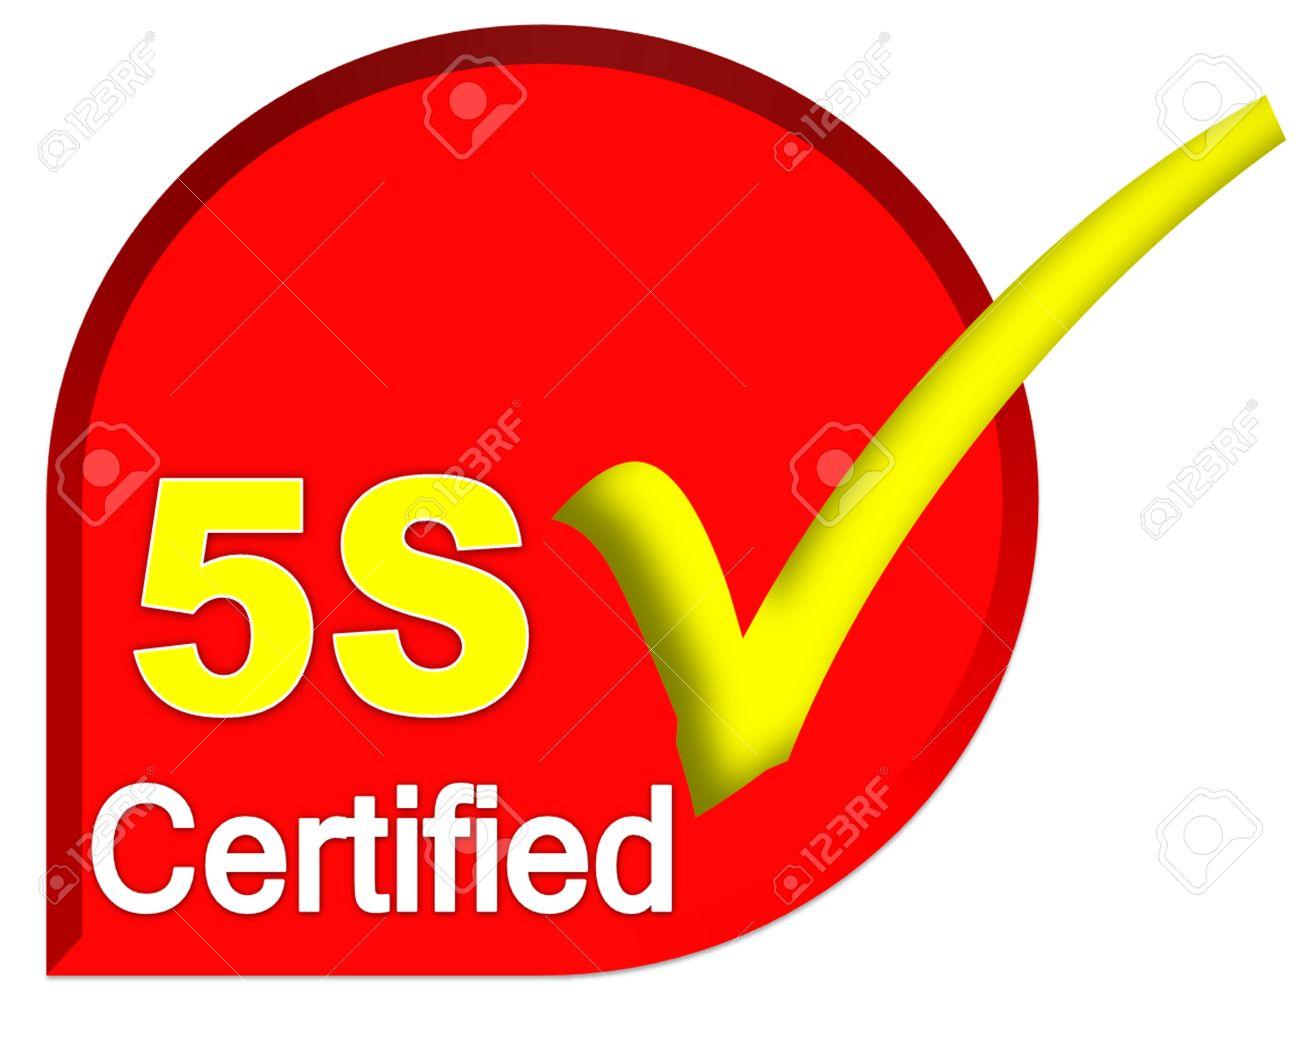 image logo 5s